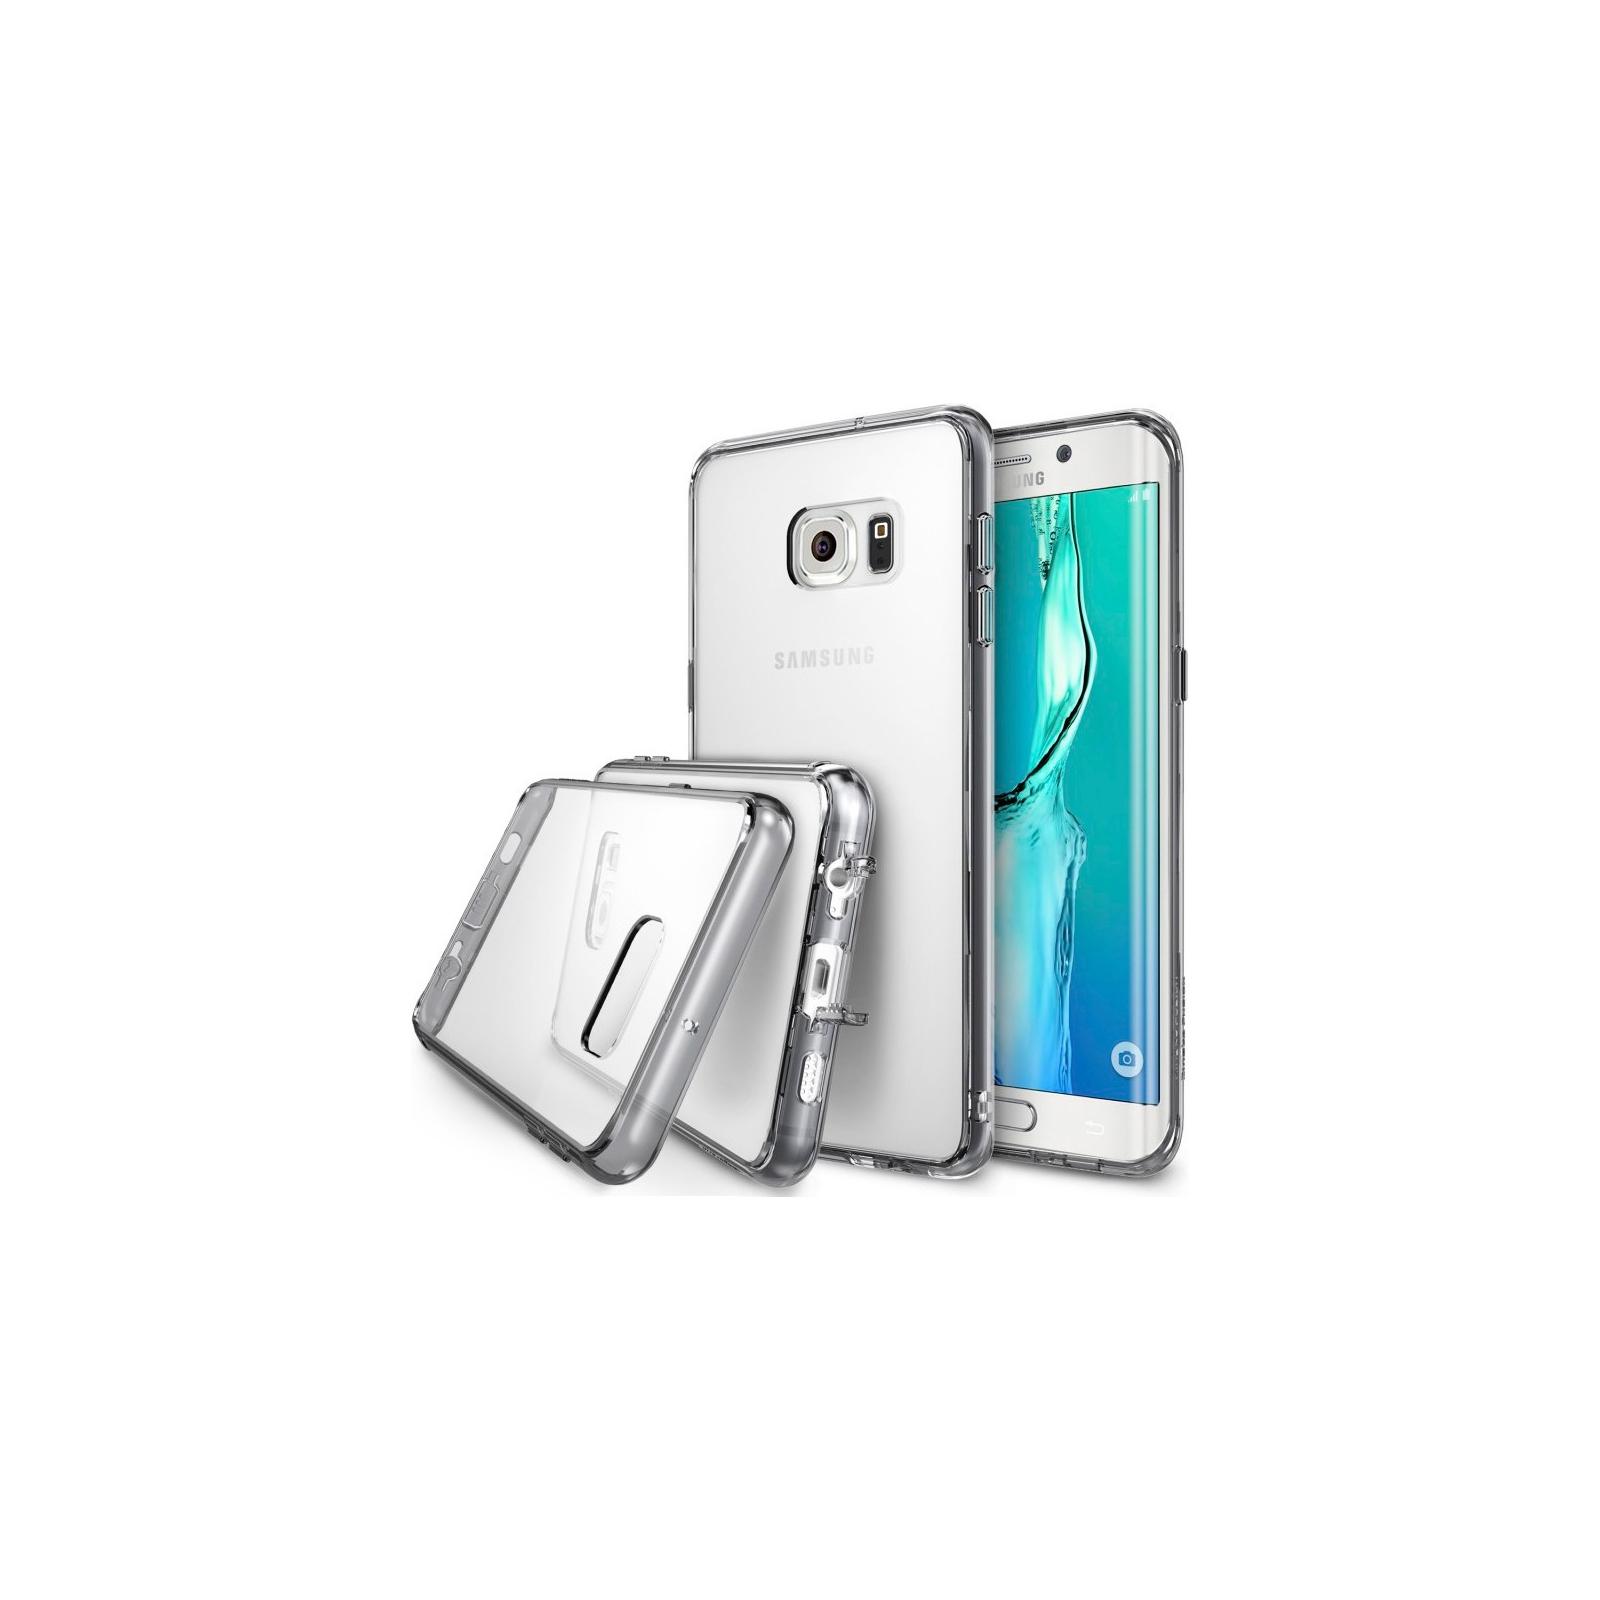 Чехол для моб. телефона Ringke Fusion для Samsung Galaxy S6 Edge Plus (Smoke Black) (170918)